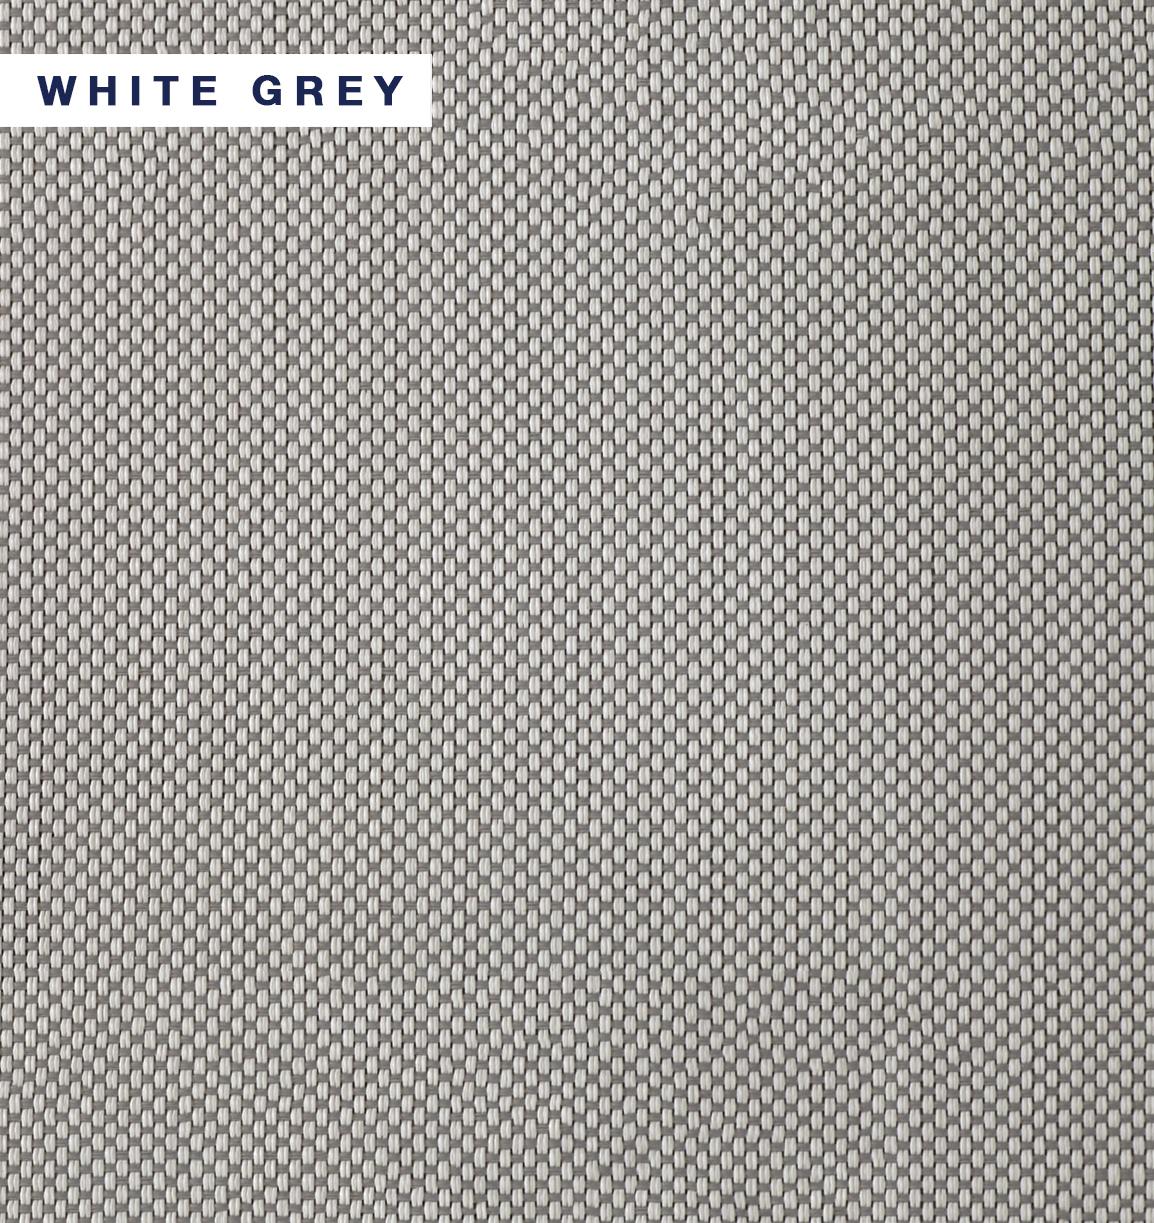 Duo Screen - White Grey.jpg